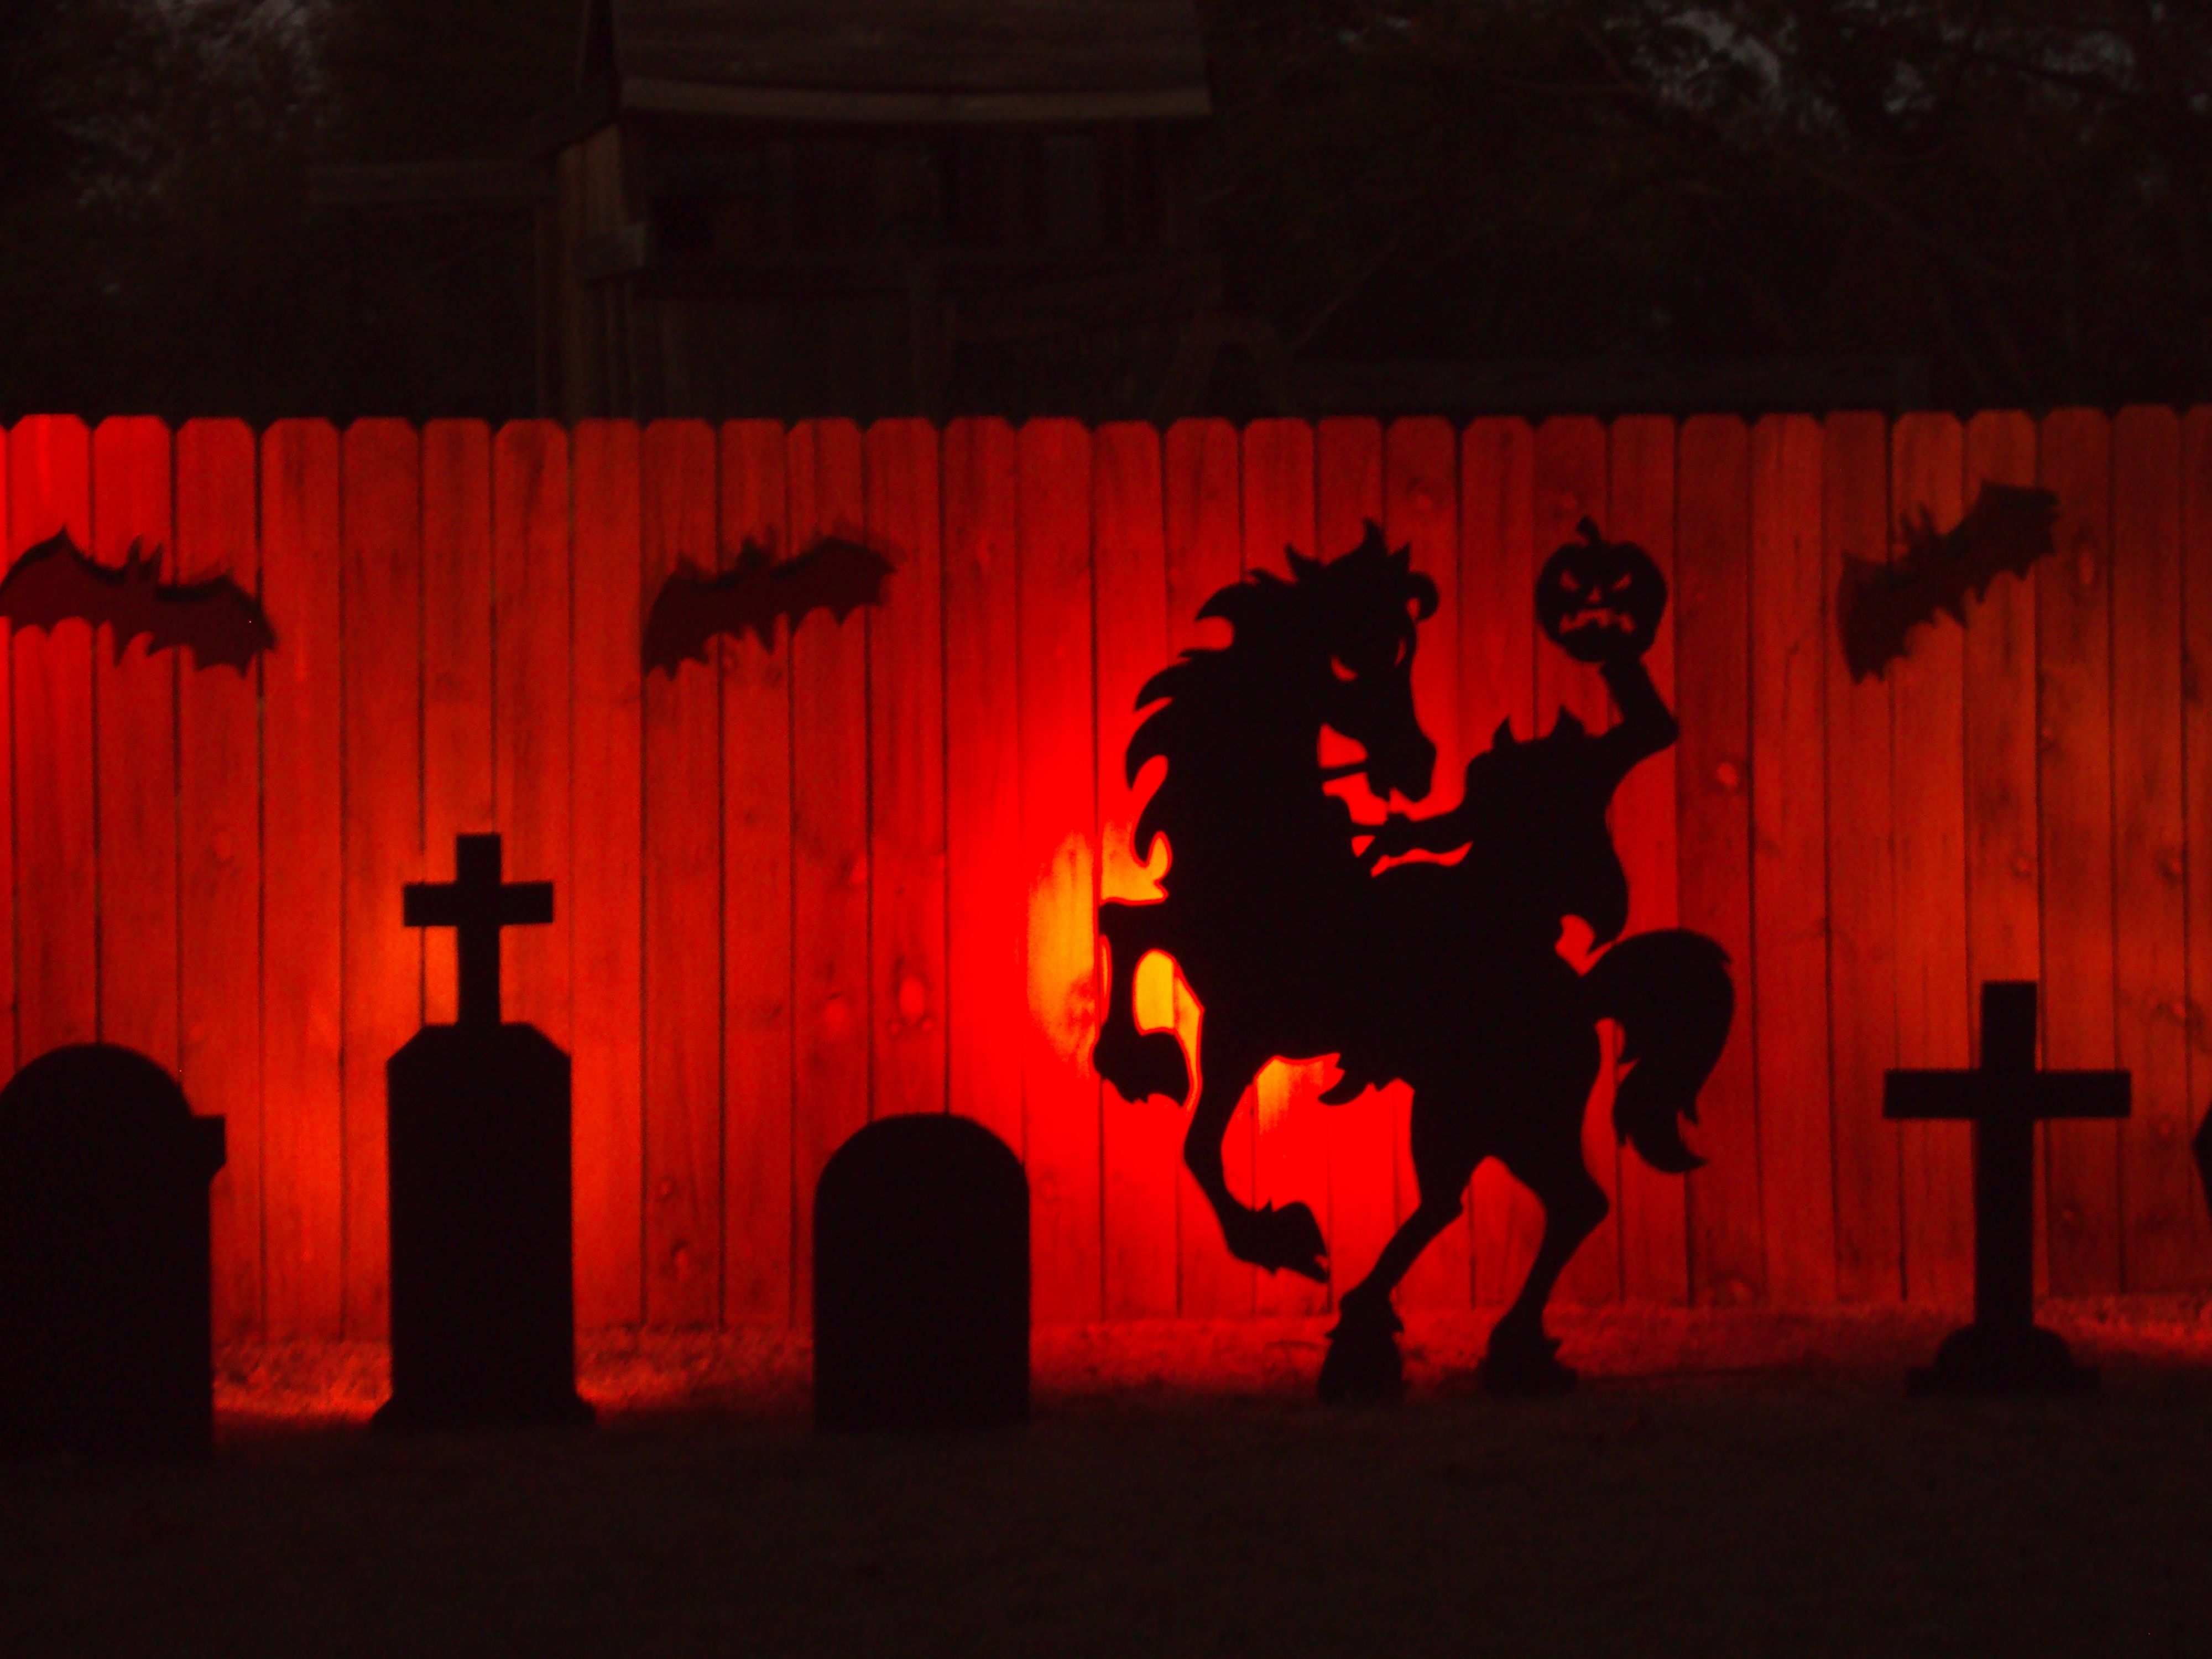 Diy halloween garage door decorations - Find This Pin And More On Halloween Facades